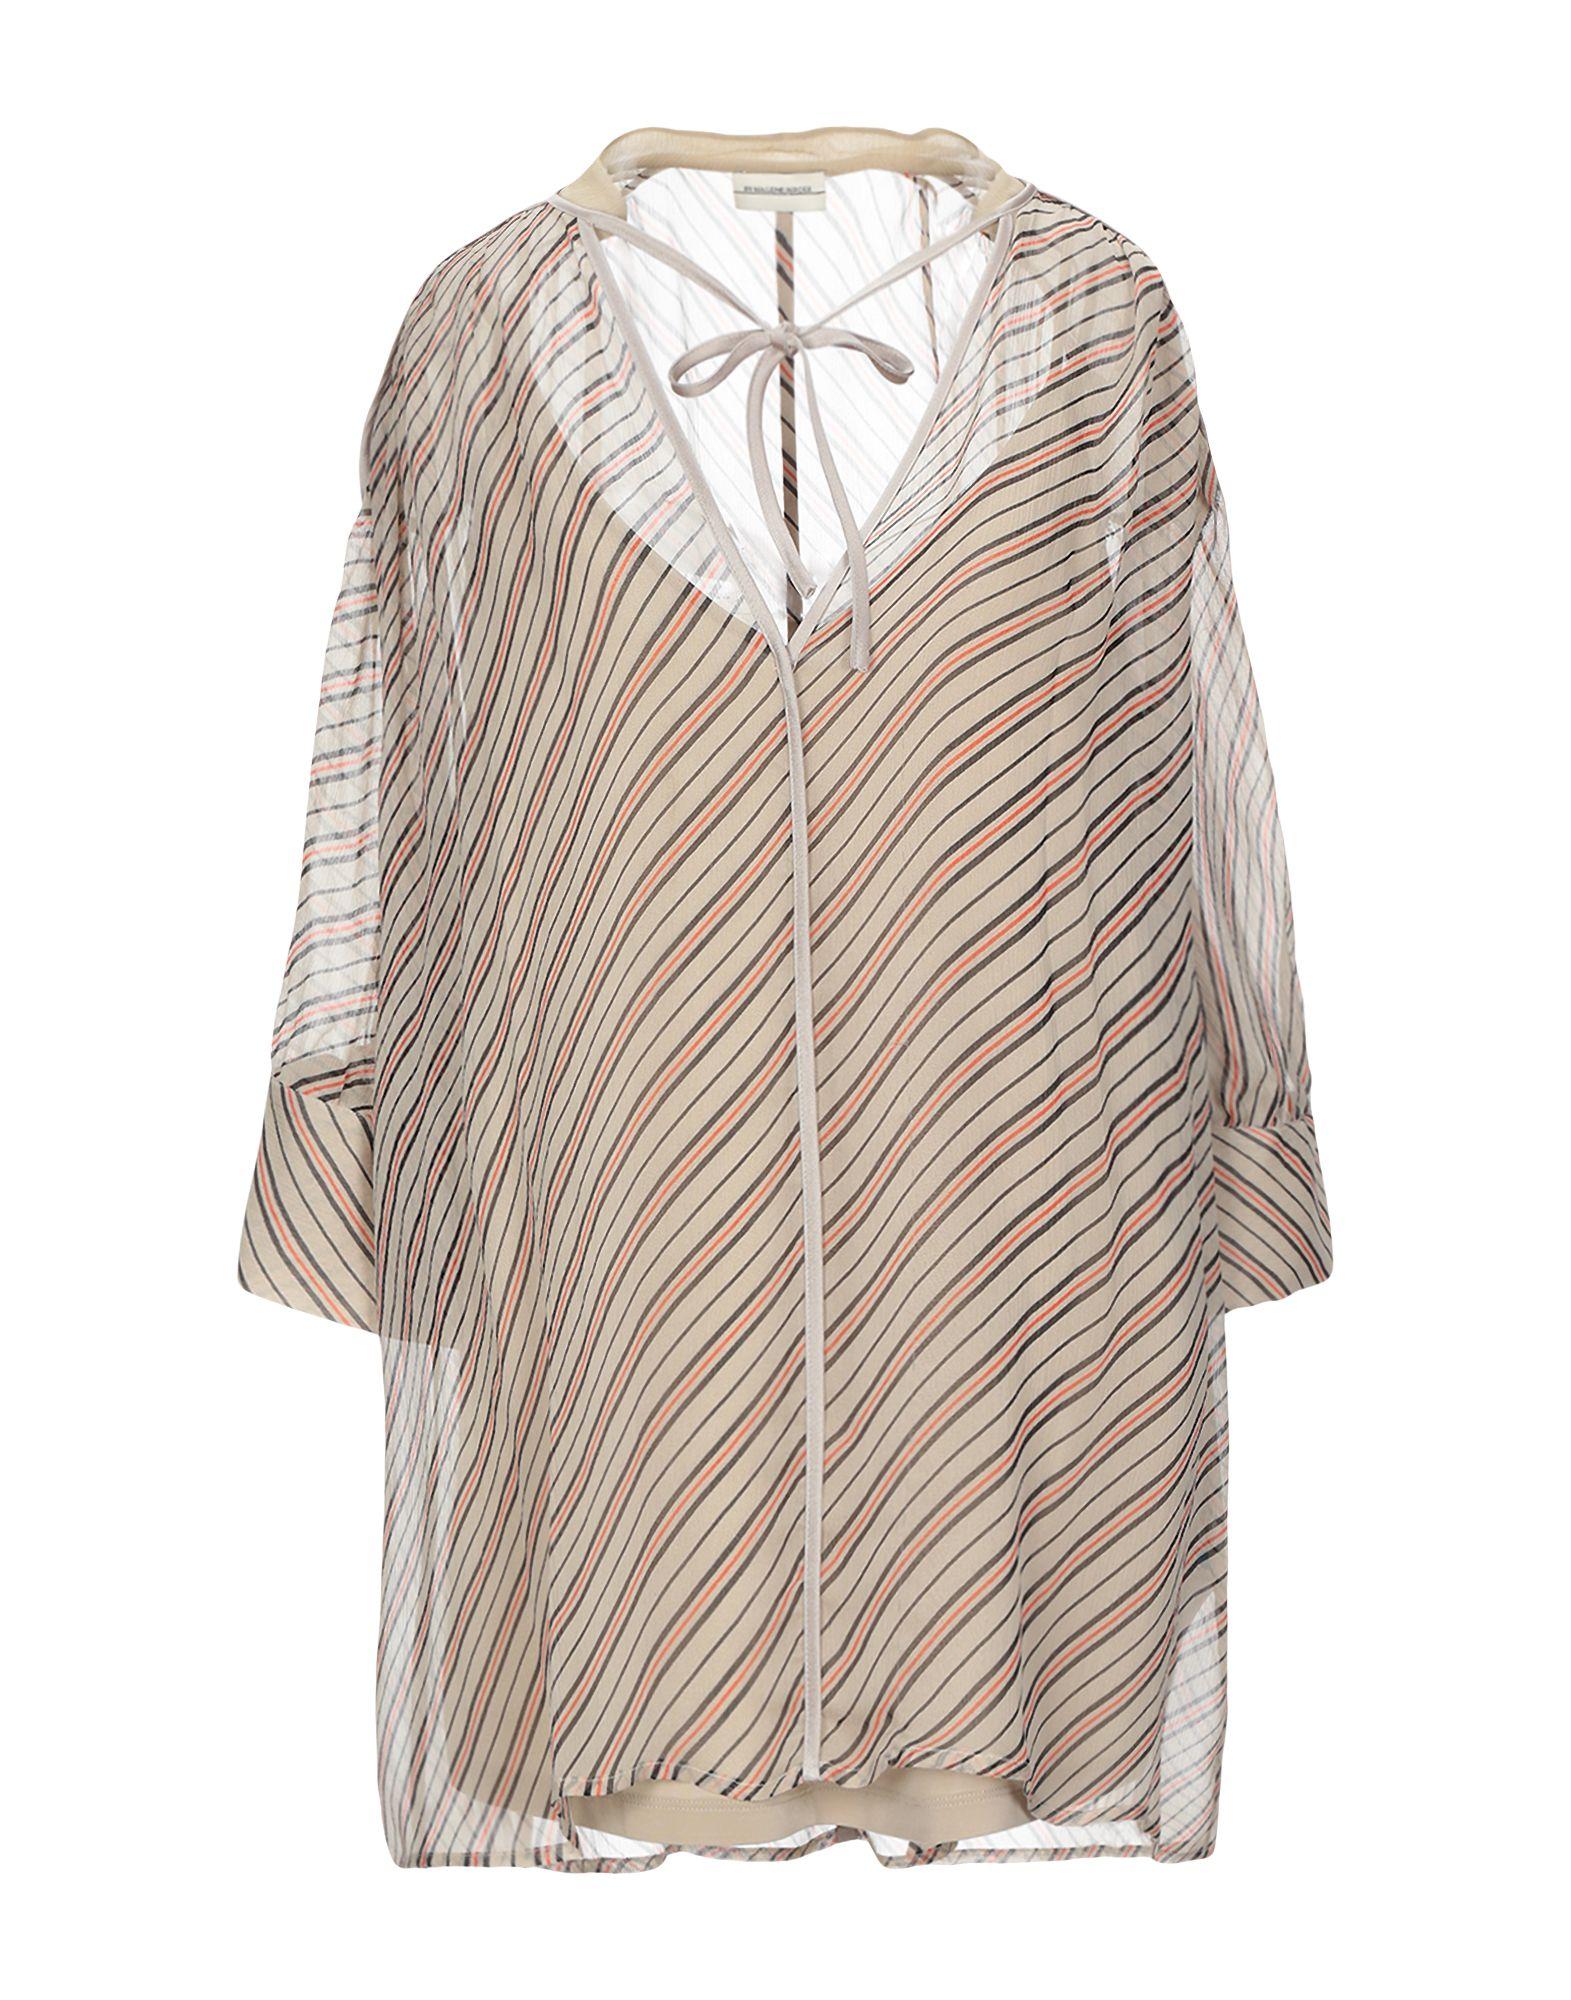 купить BY MALENE BIRGER Блузка по цене 17000 рублей